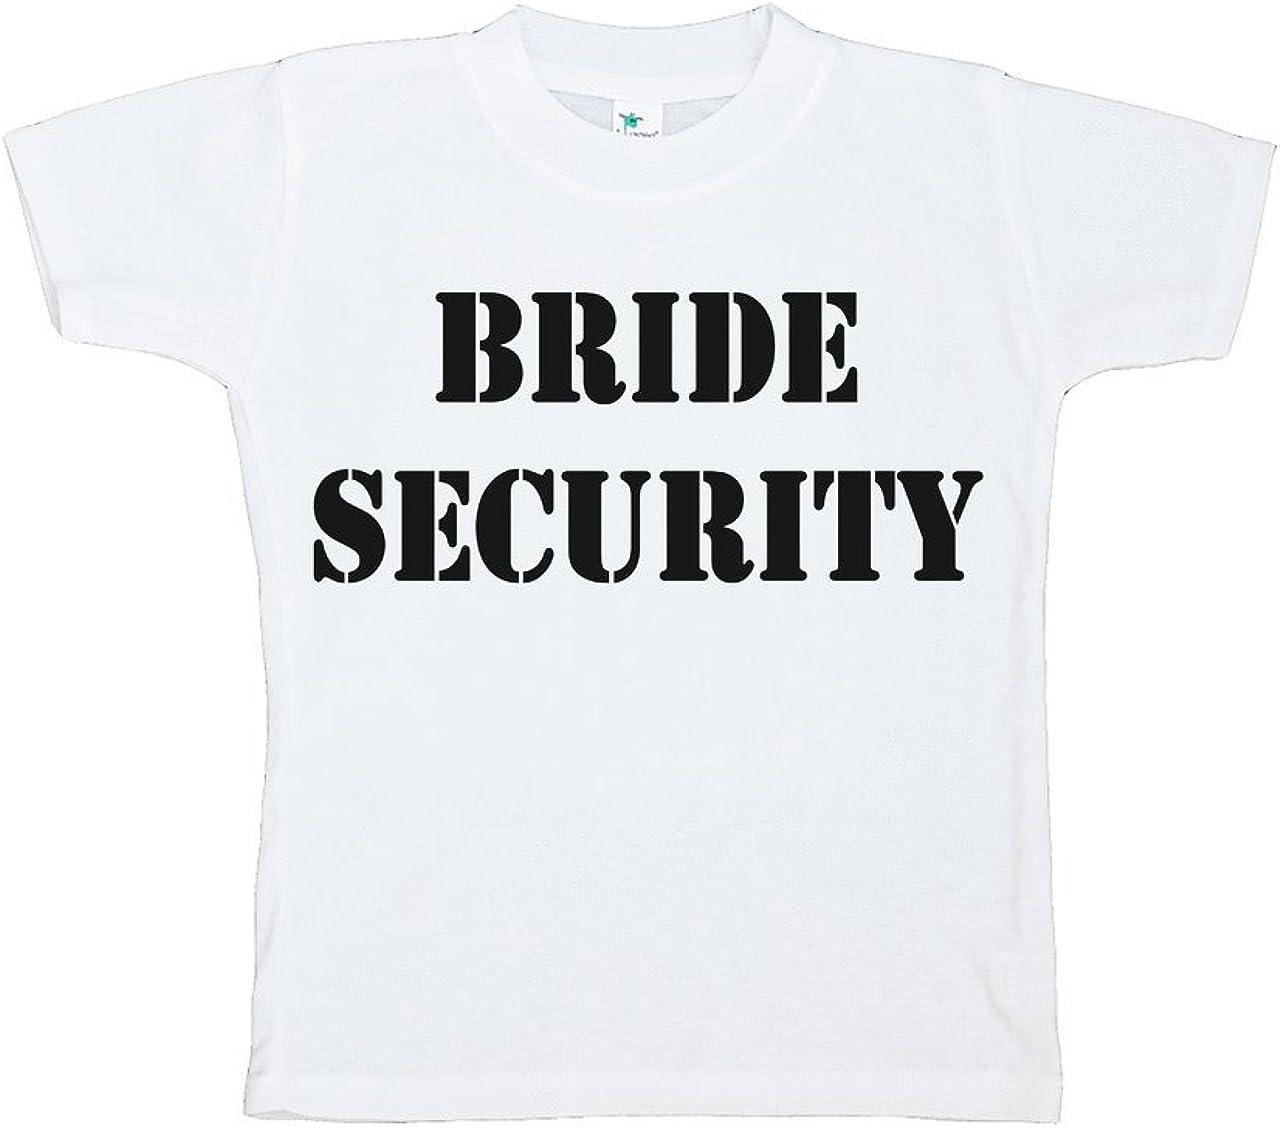 Custom Party Shop Toddler Boy's Bride Security Wedding T-Shirt